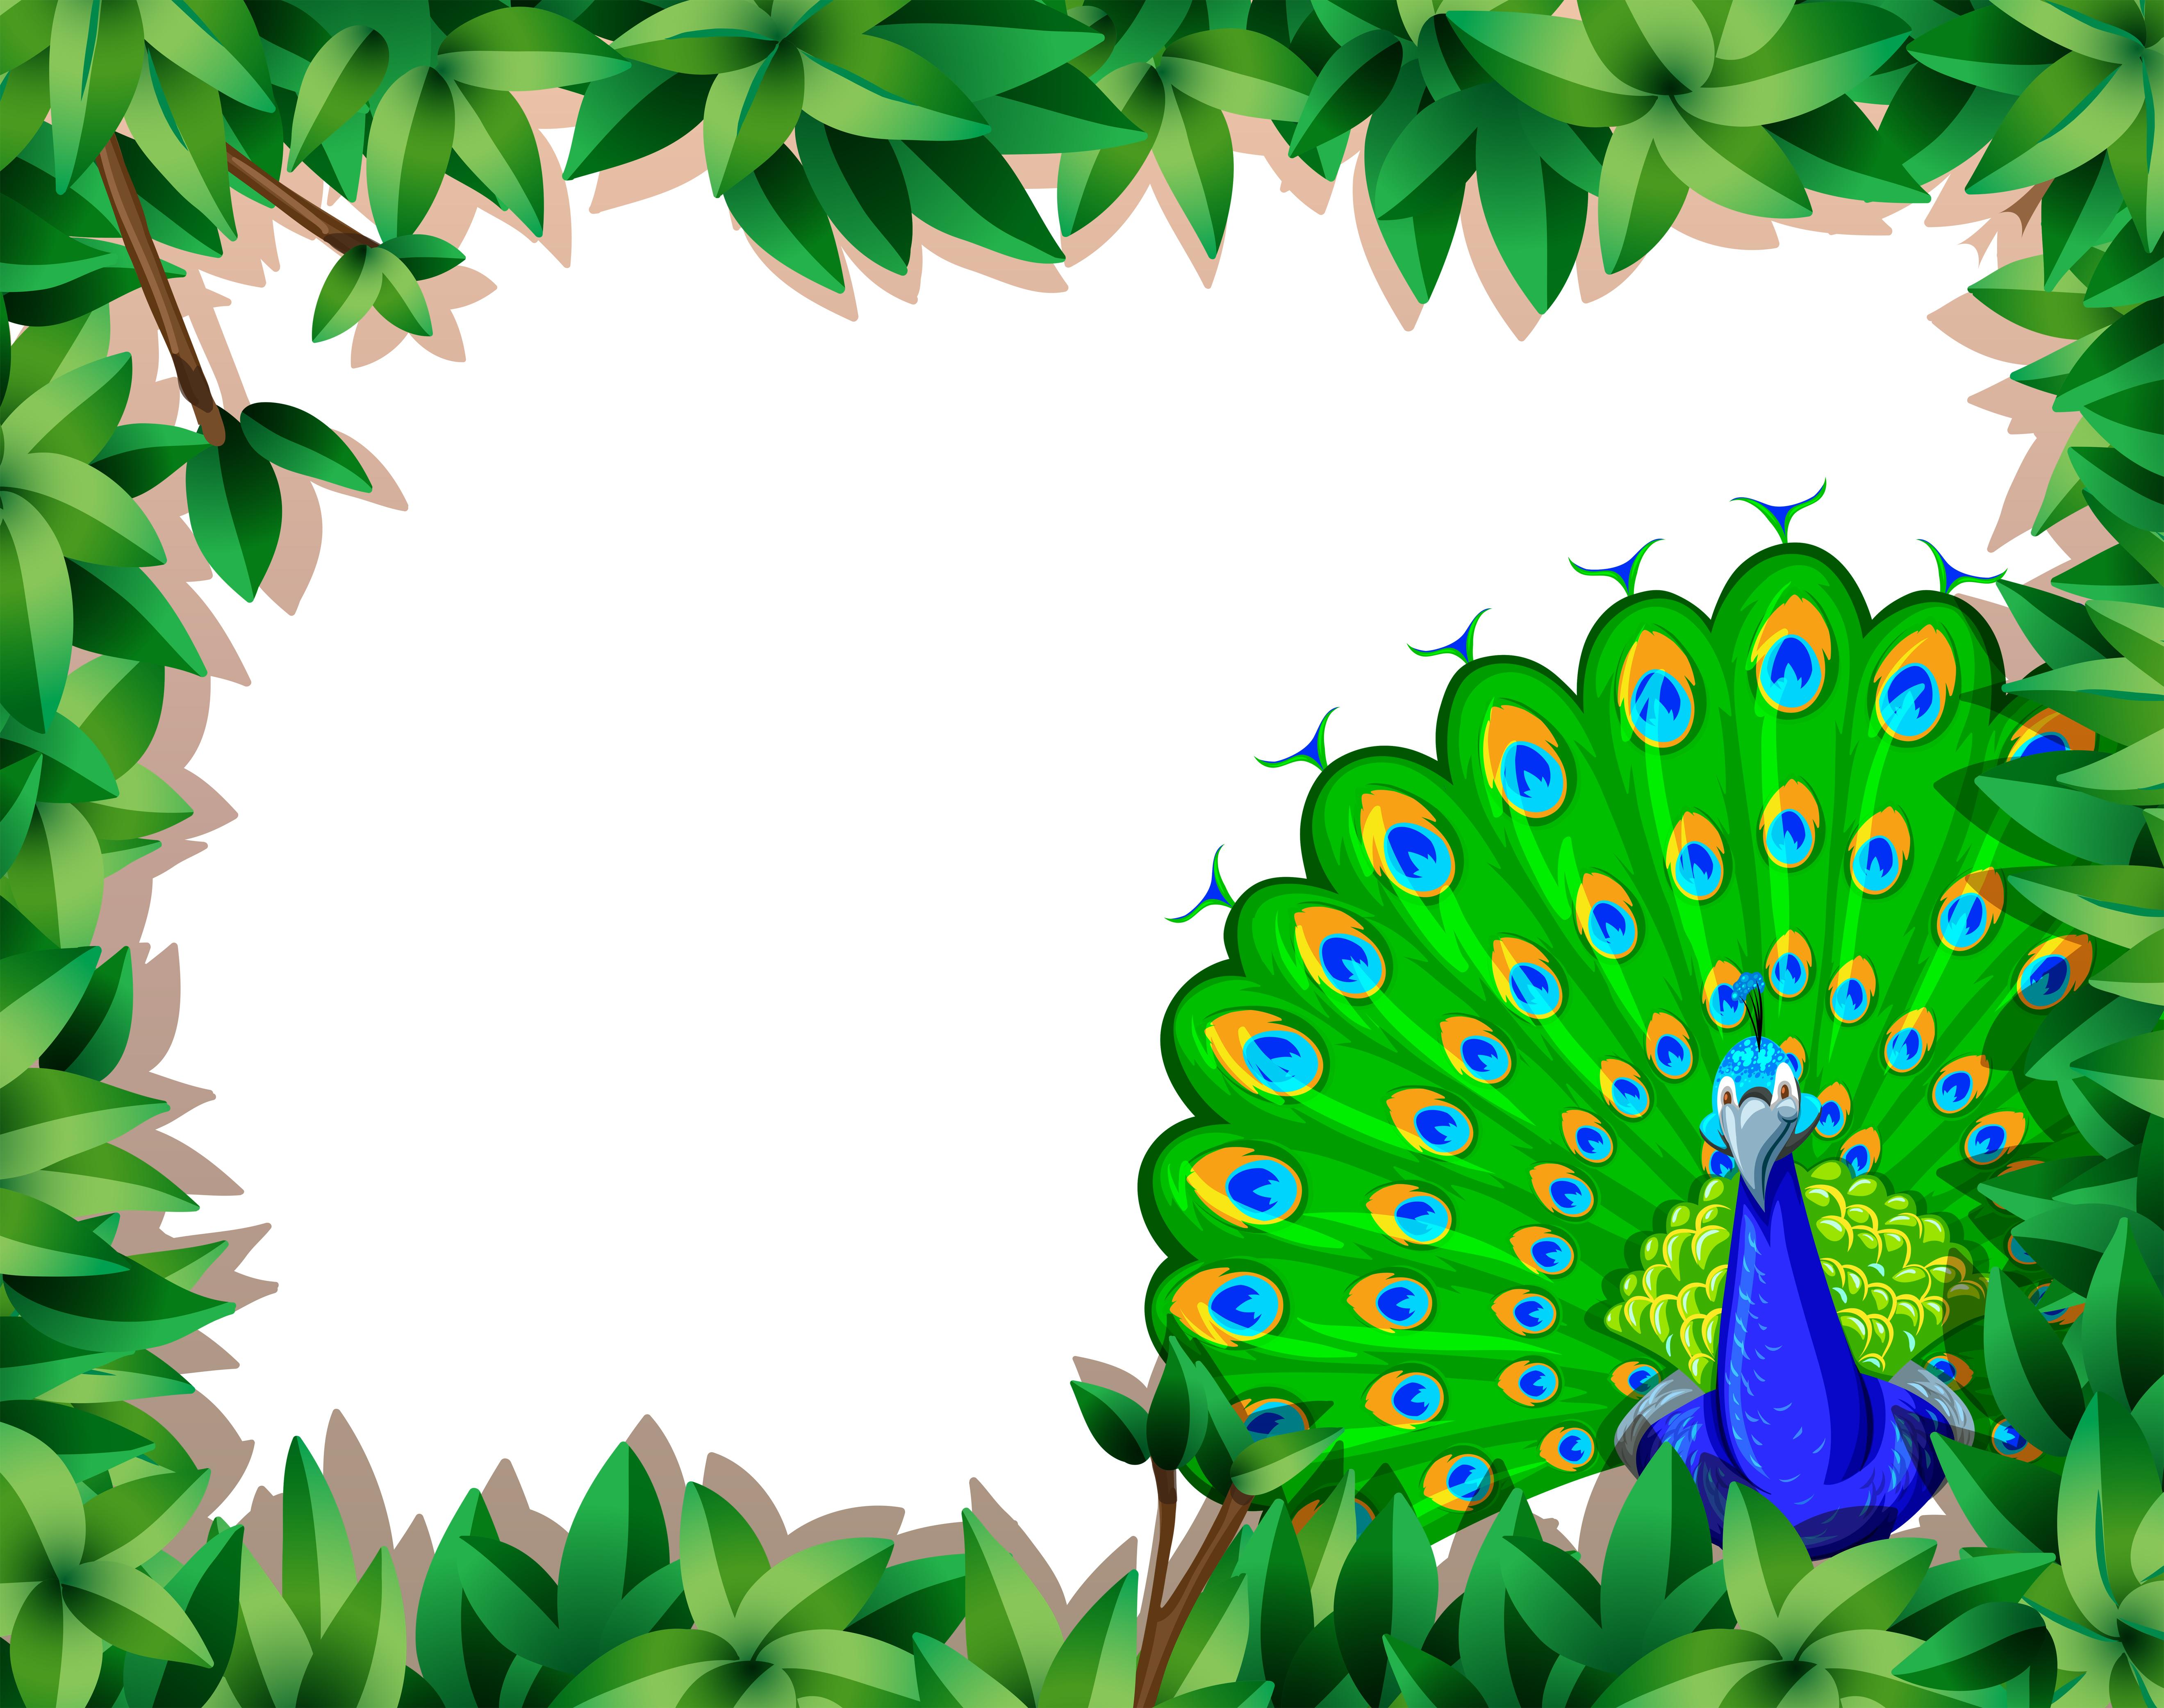 Peacock Borders Free Vector Art 4 Free Downloads